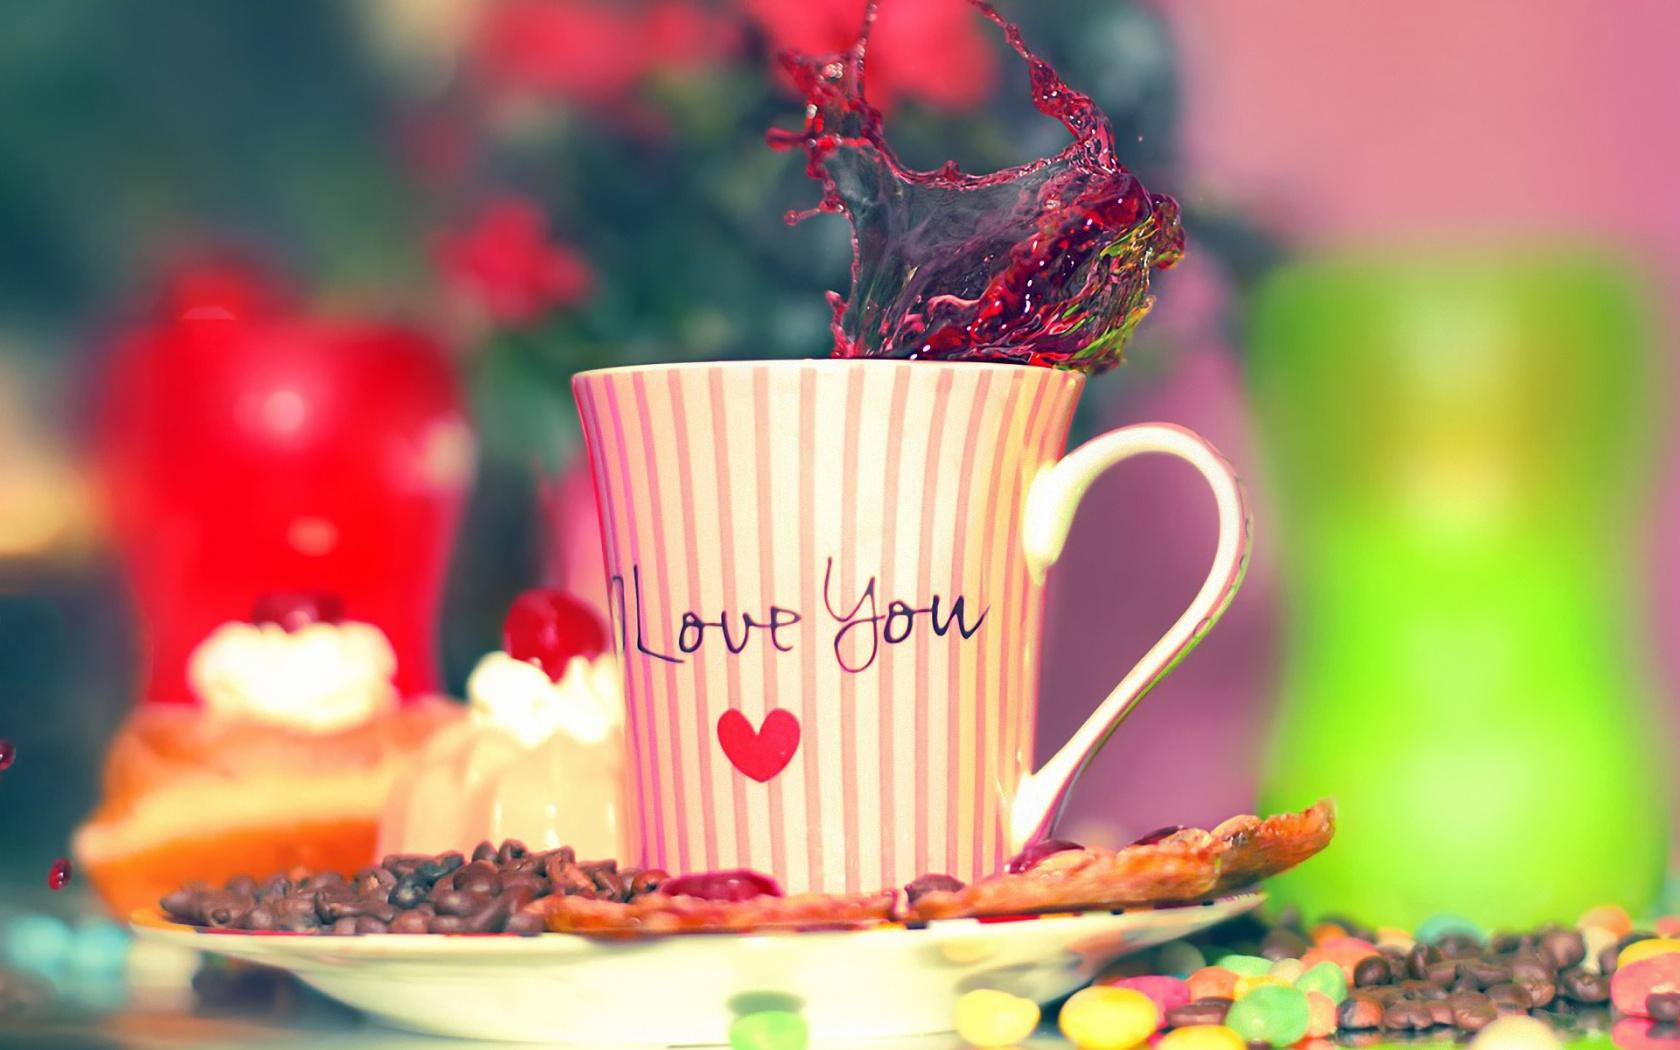 Wallpaper download love you - I Love U Wallpapers